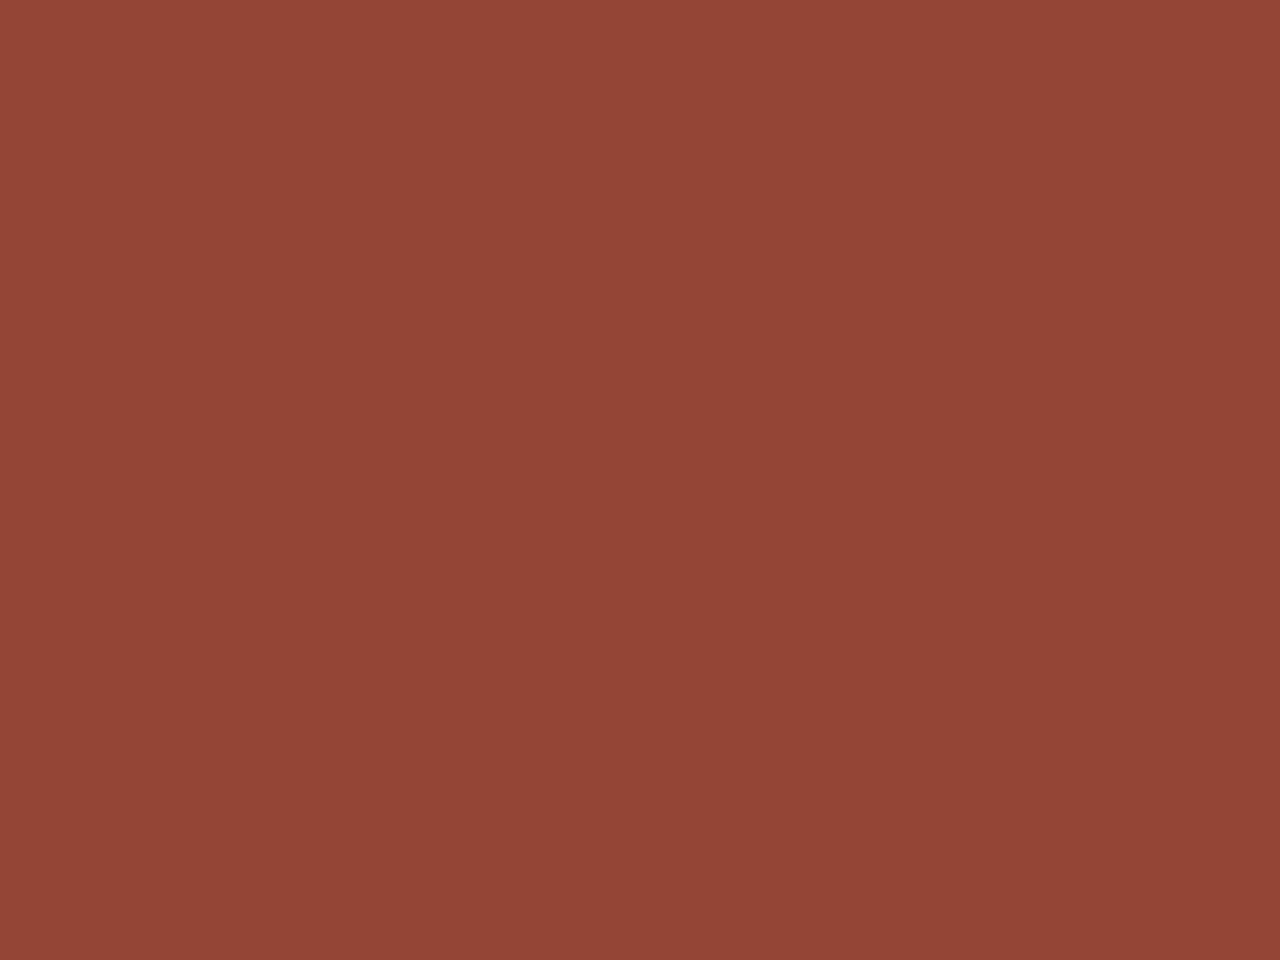 1280x960 Chestnut Solid Color Background